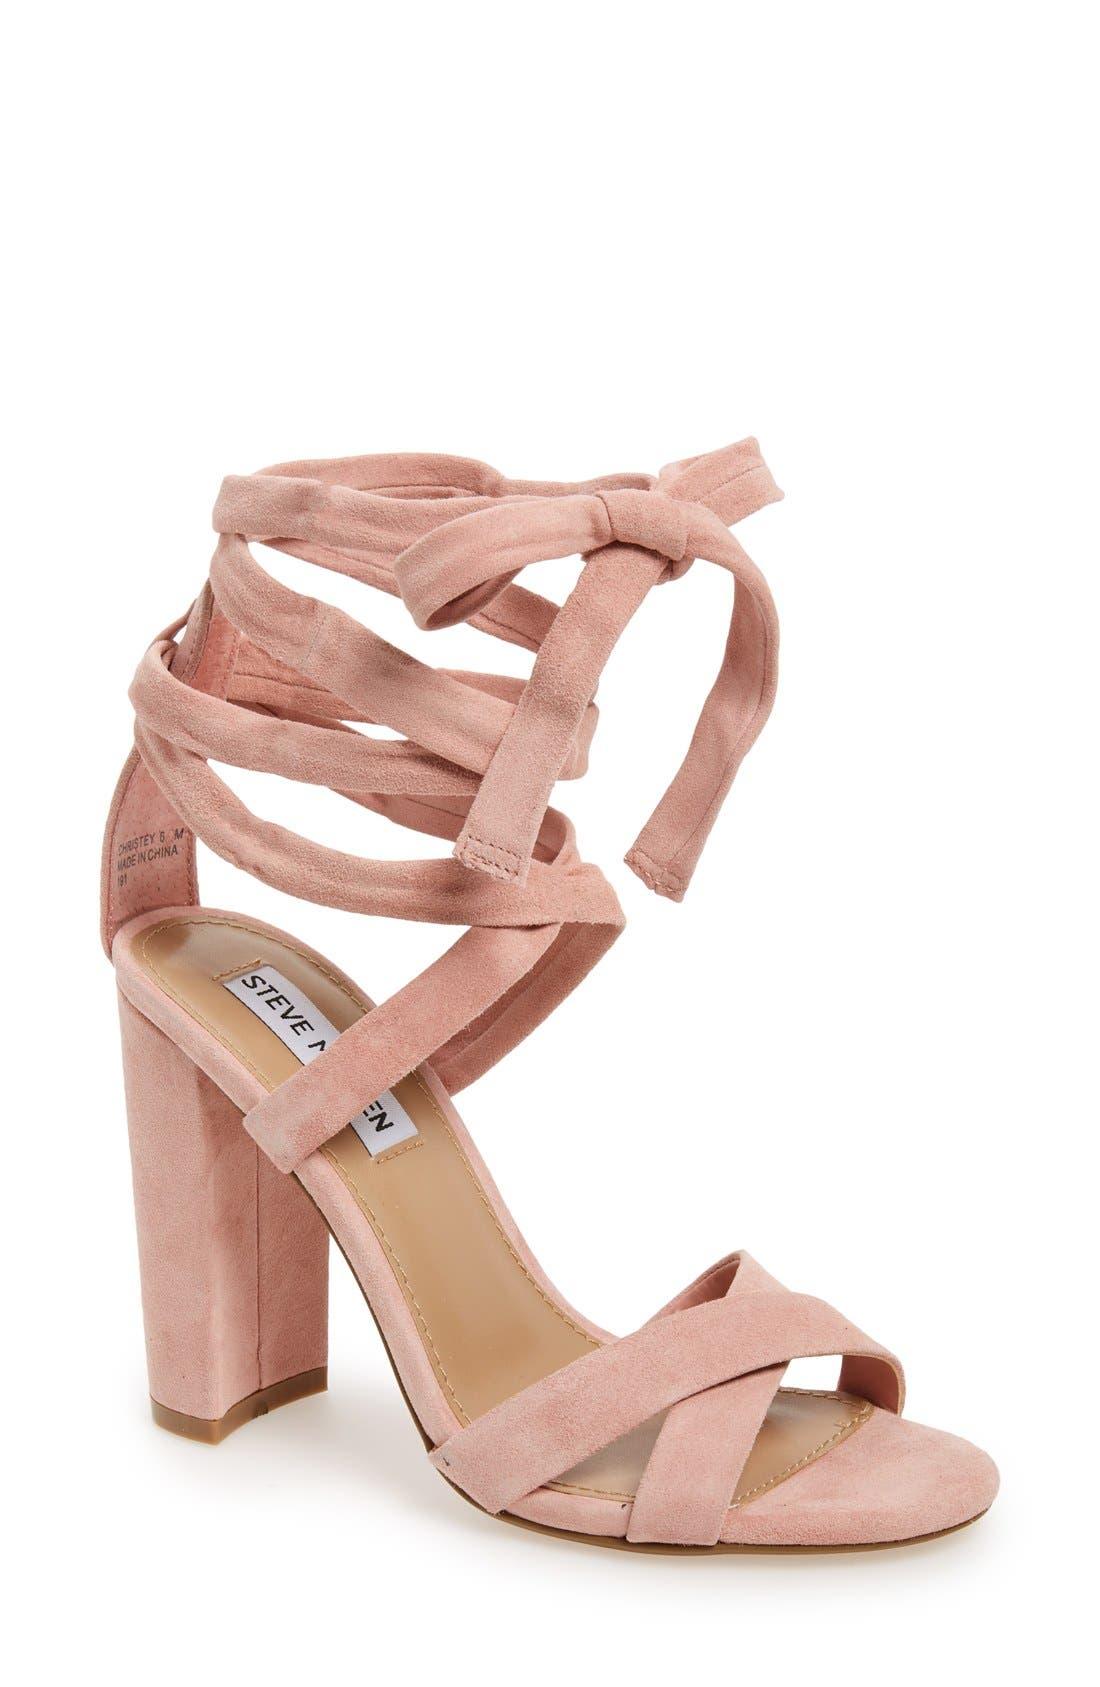 'Christey' Wraparound Ankle Tie Sandal,                             Main thumbnail 1, color,                             650